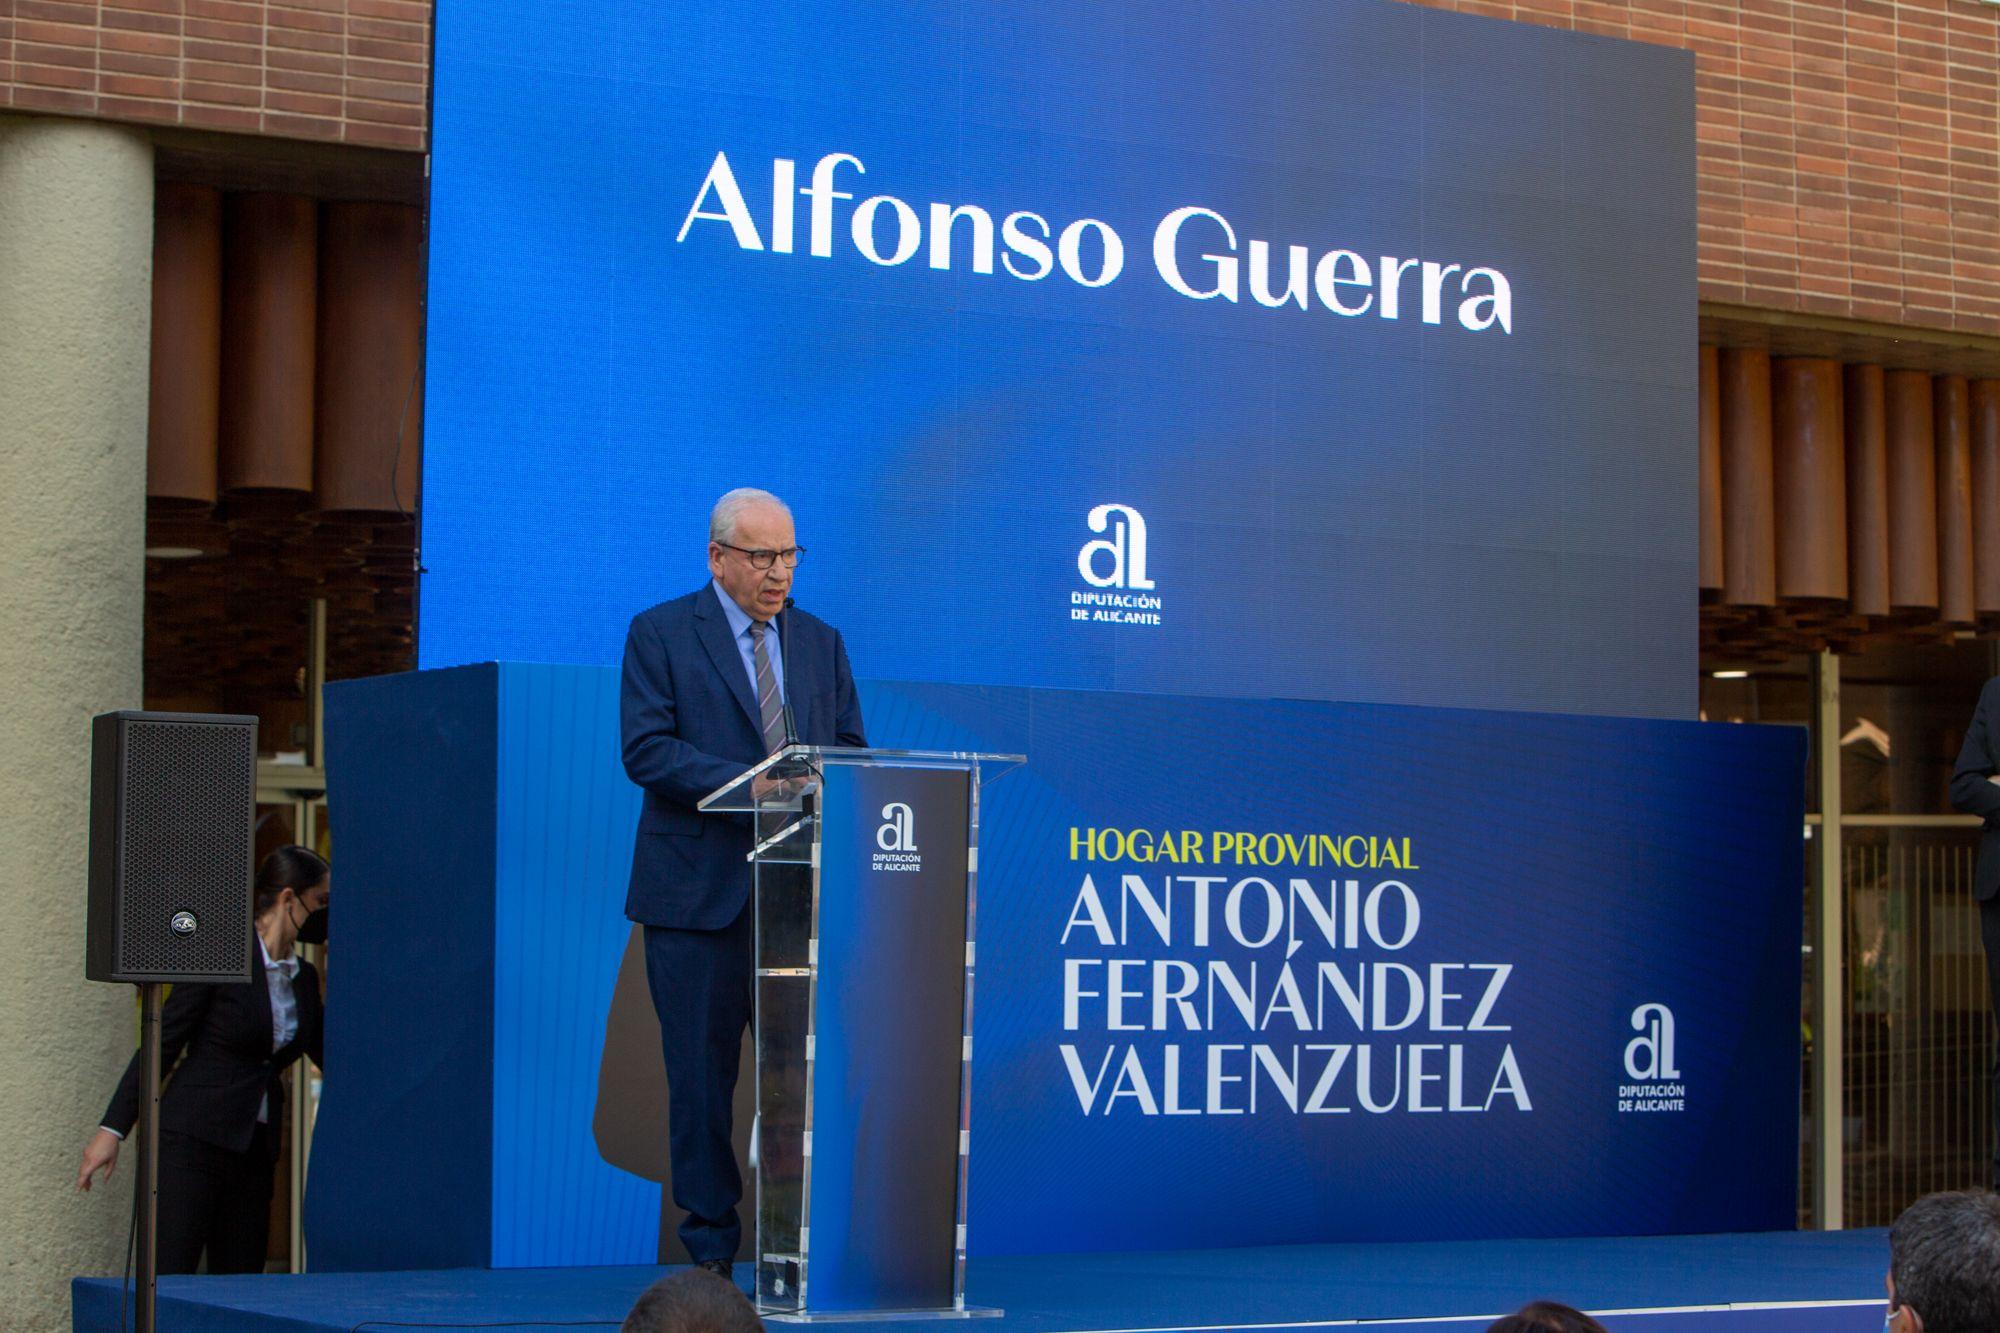 Homenaje a Antonio Fernández Valenzuela